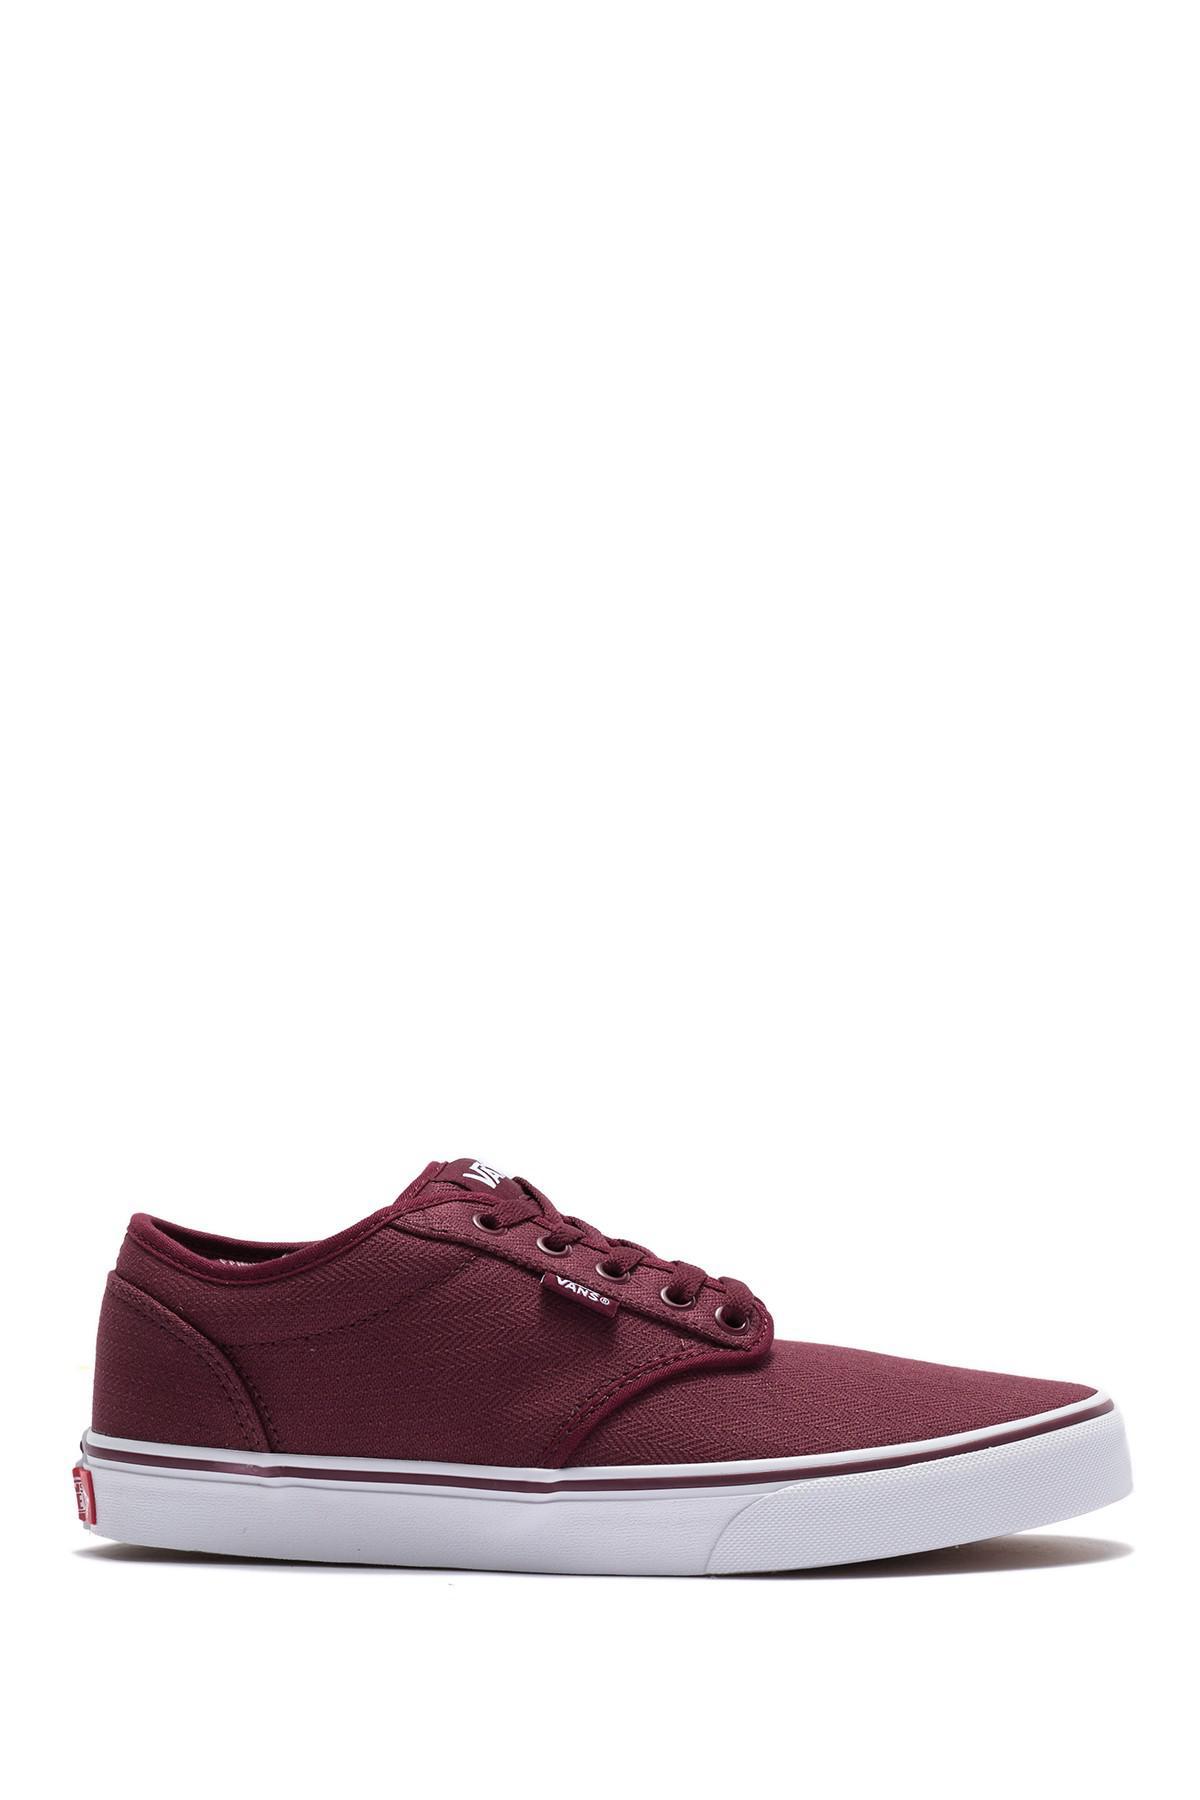 3e7f5738106 Vans - Multicolor Atwood Herringbone Plaid Sneaker for Men - Lyst. View  fullscreen